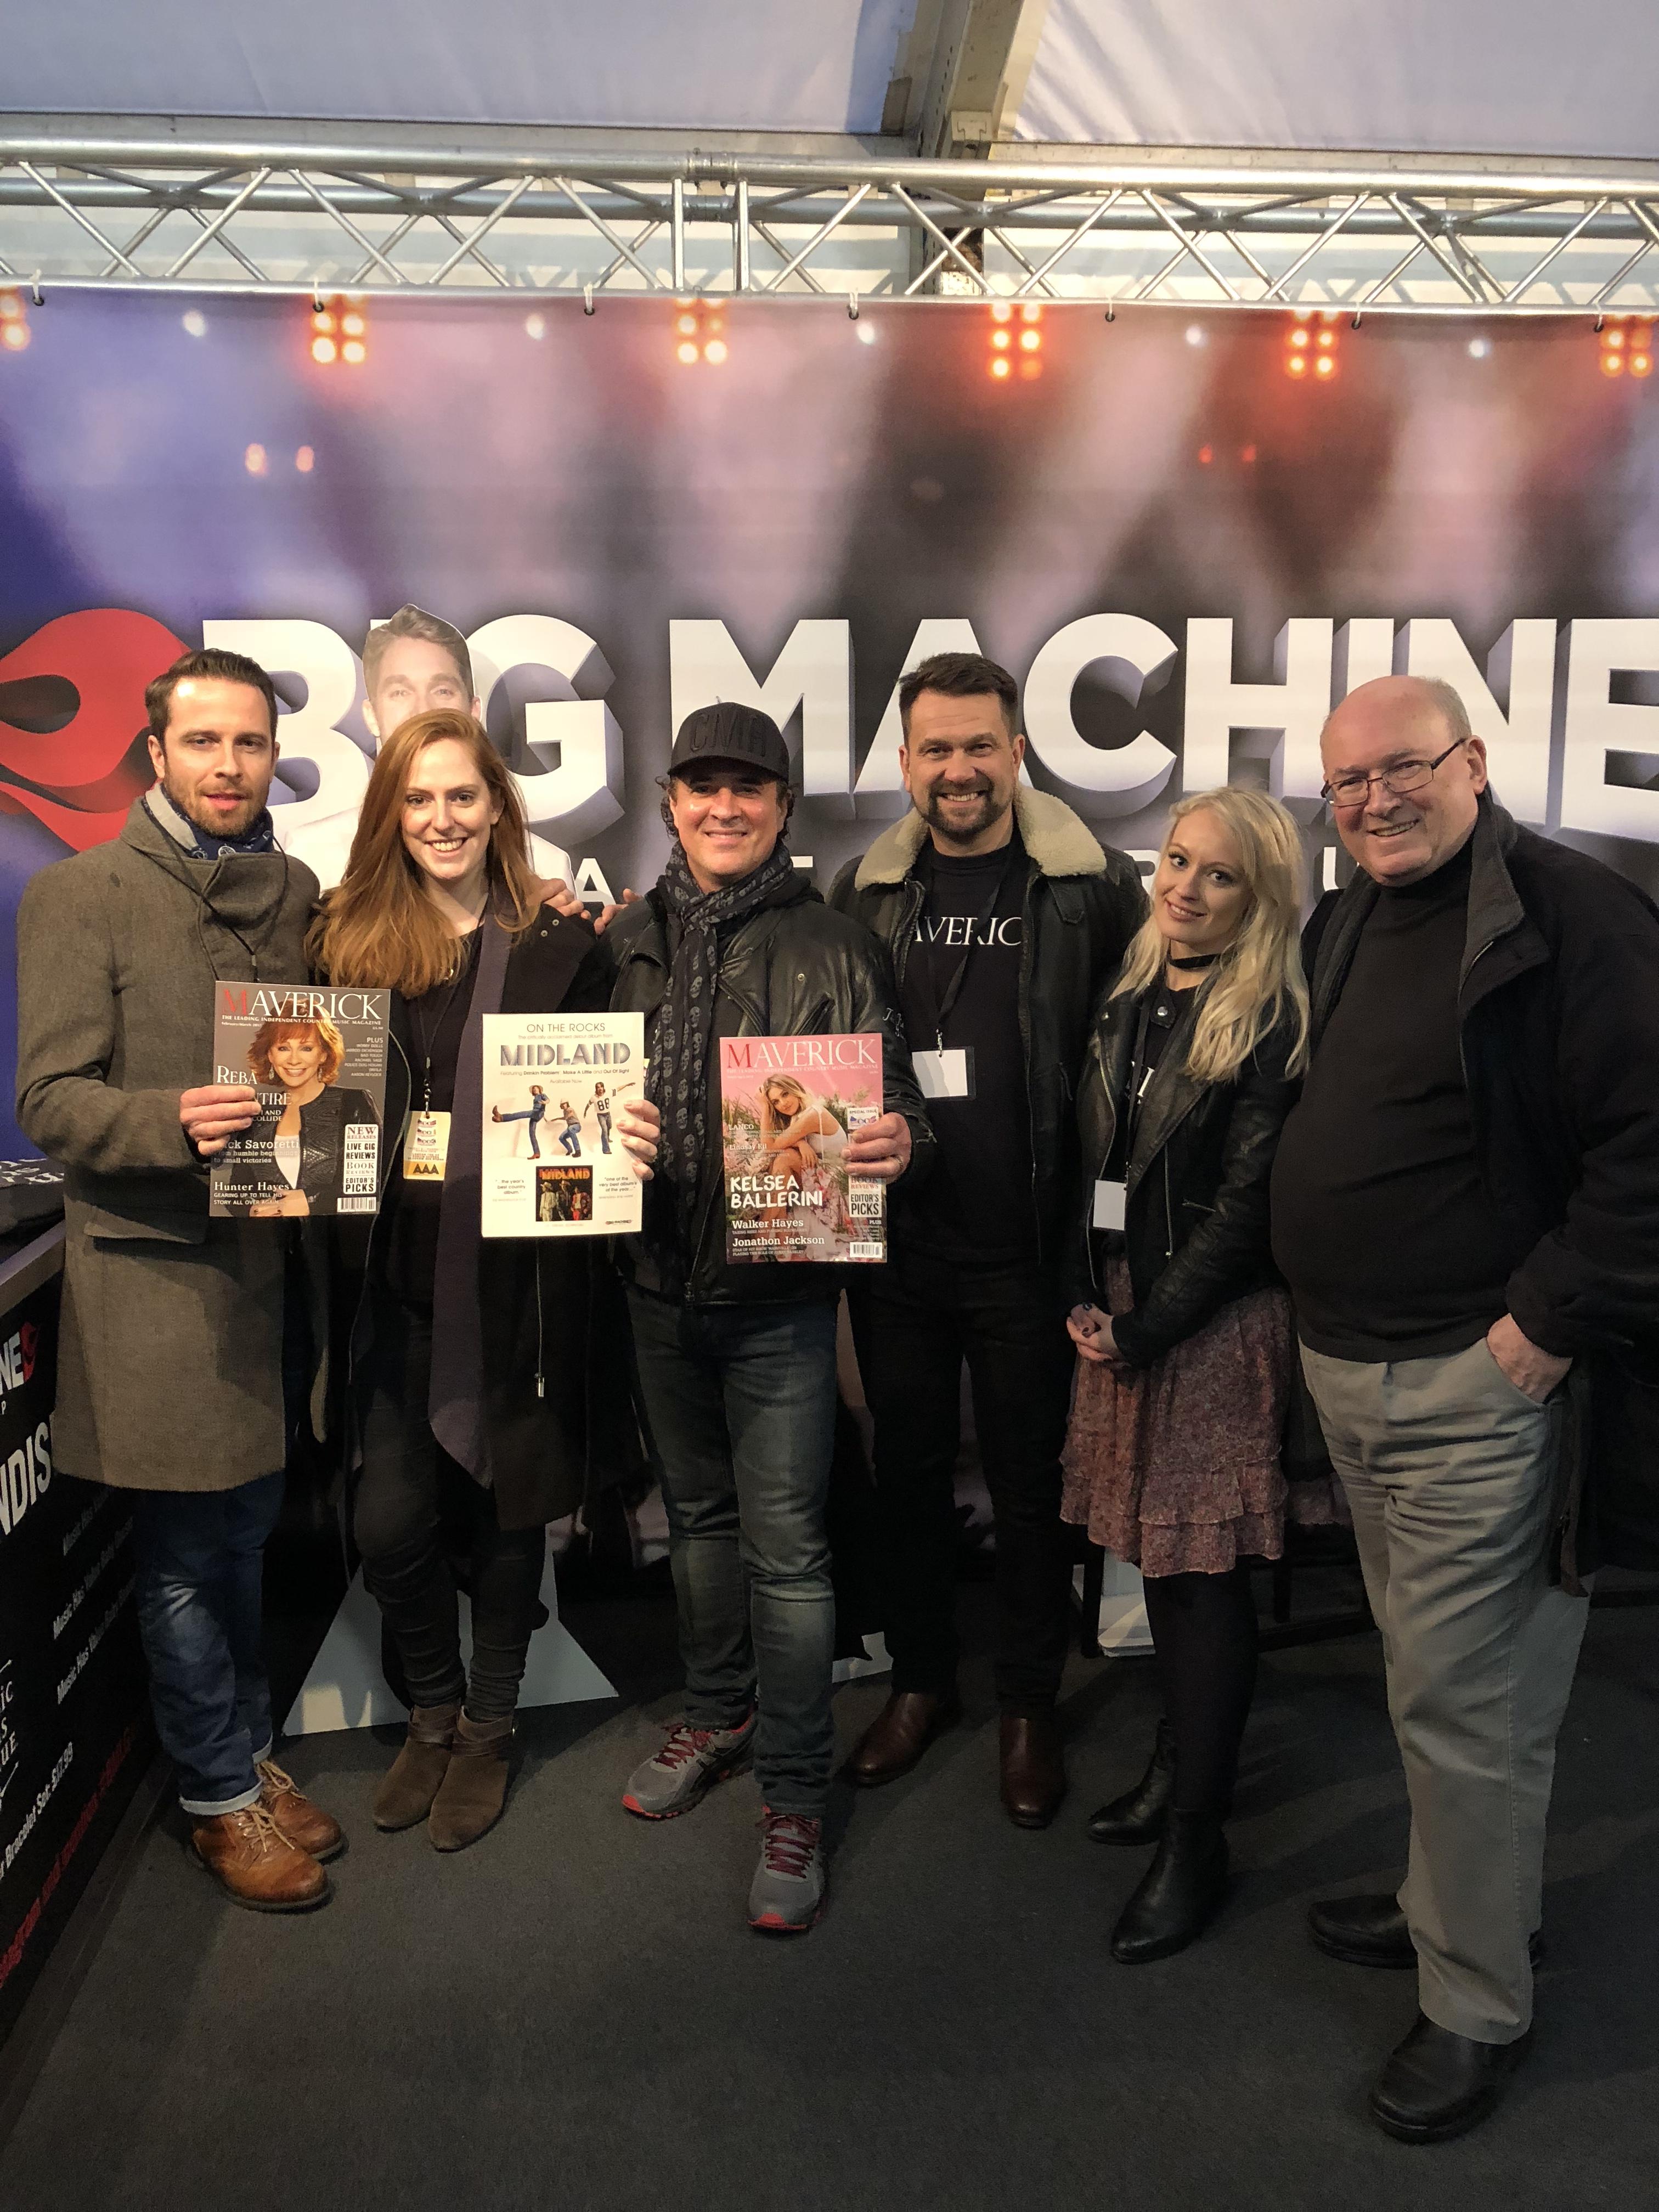 The Big Machine Group with Maverick: Scott Borchetta (third from left); Managing Director, David Rossiter, Hand Media International (third from right); Maverick's Editor, Holly Payne, (second from right)